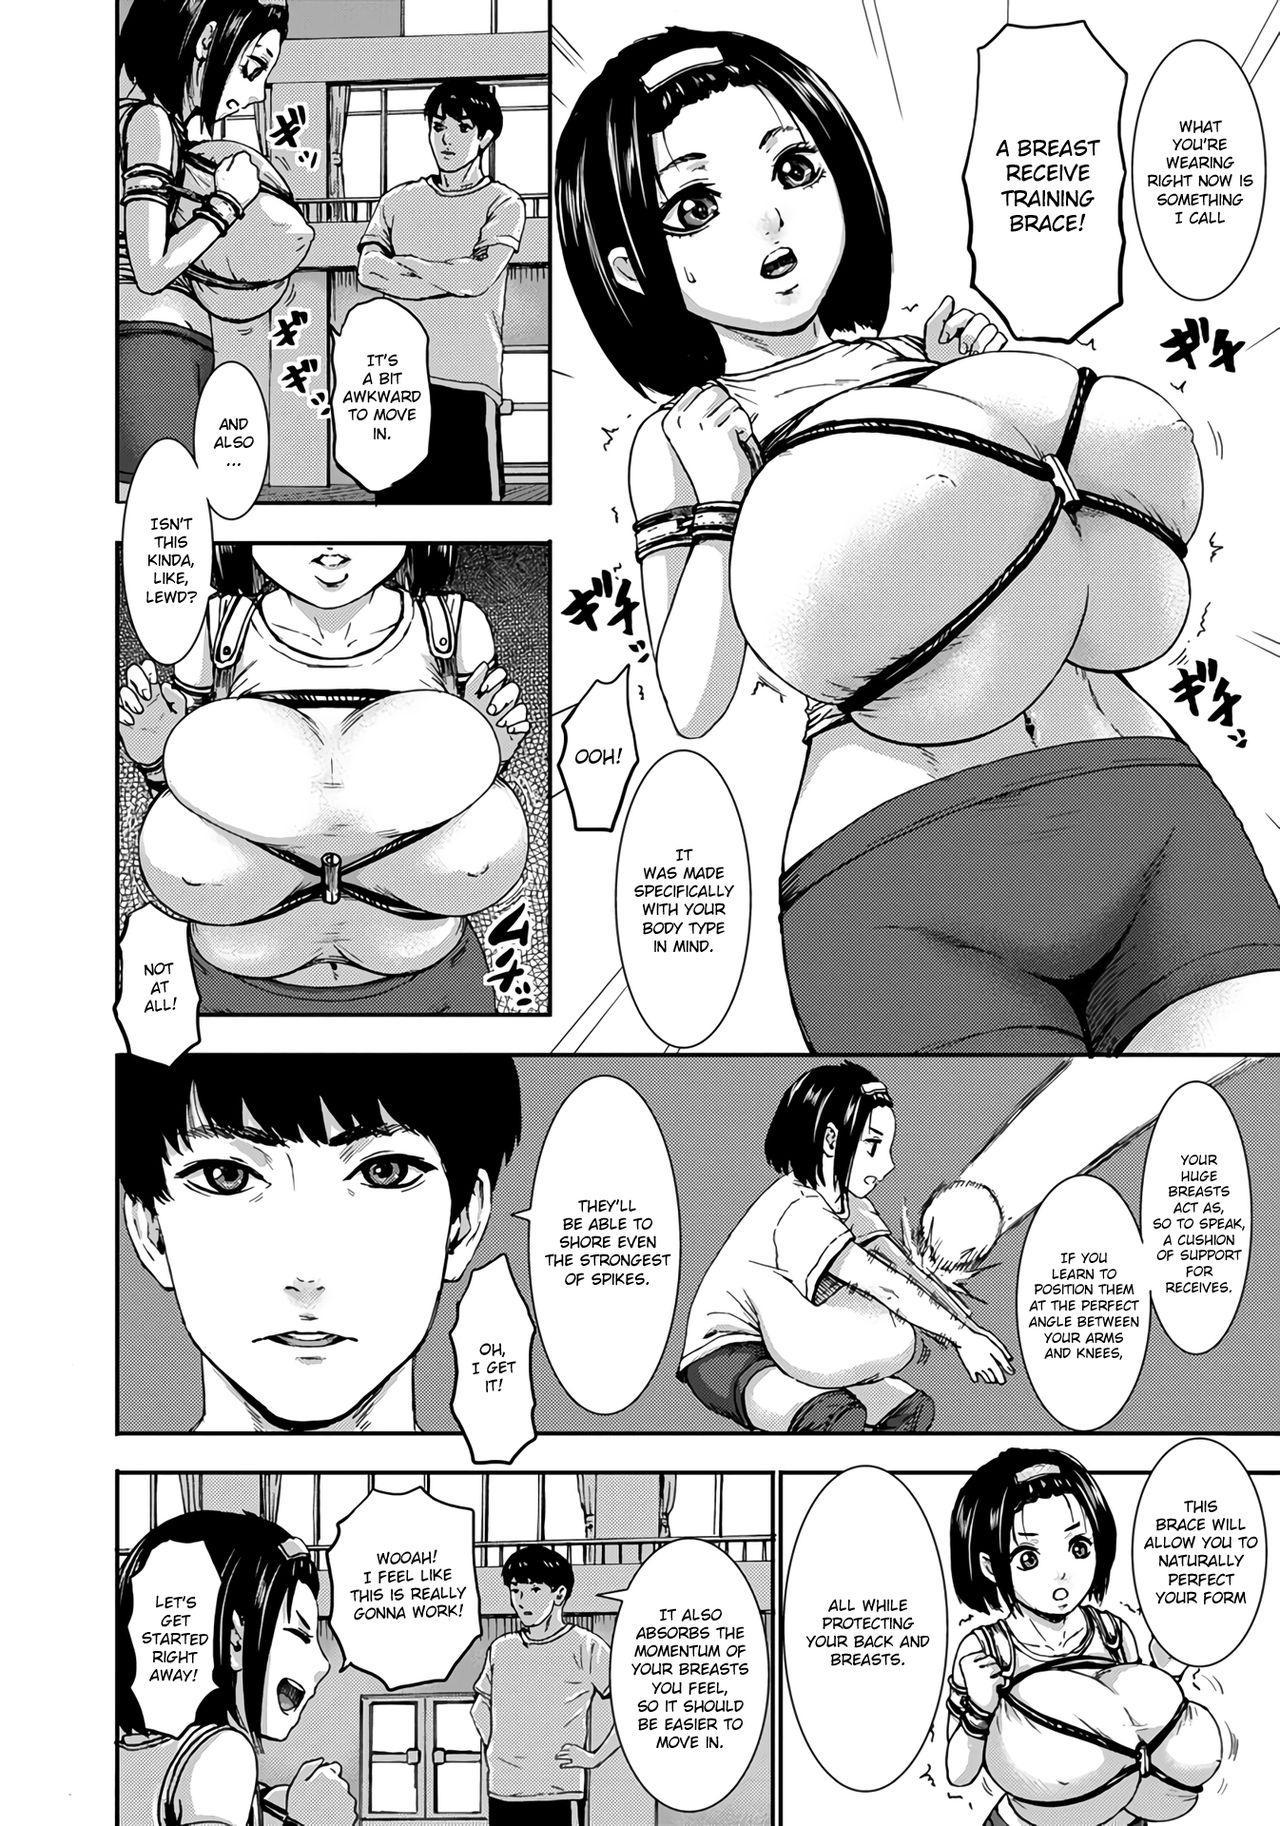 Chounyuu Gakuen | Academy For Huge Breasts Ch. 1-3 51